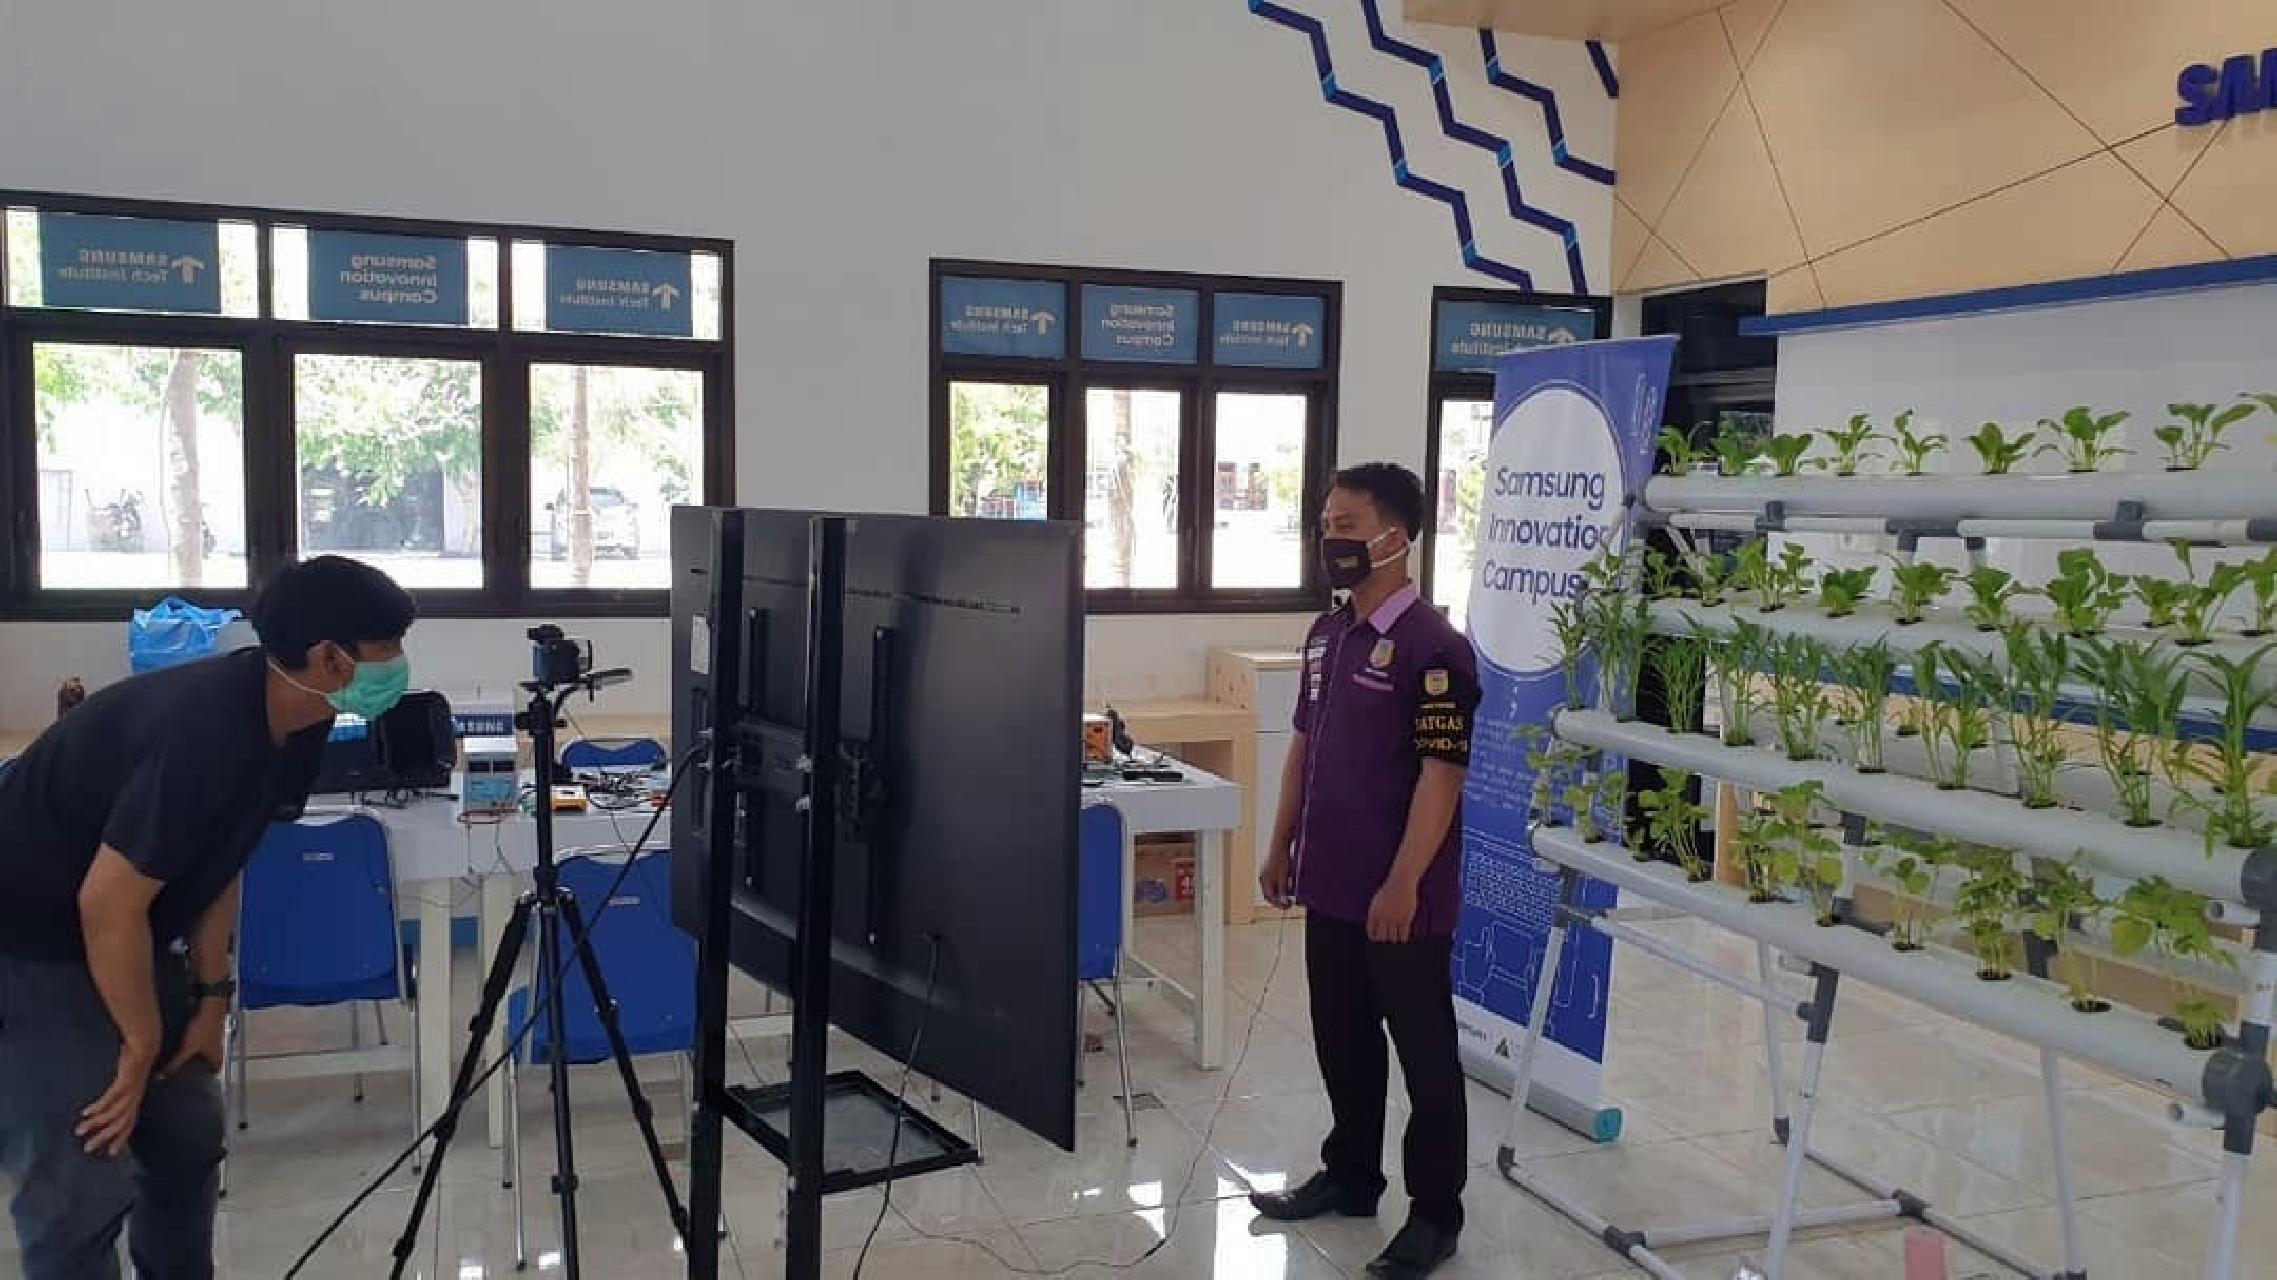 4 Fakta kompetisi berbasis teknologi digital Samsung Innovation Campus